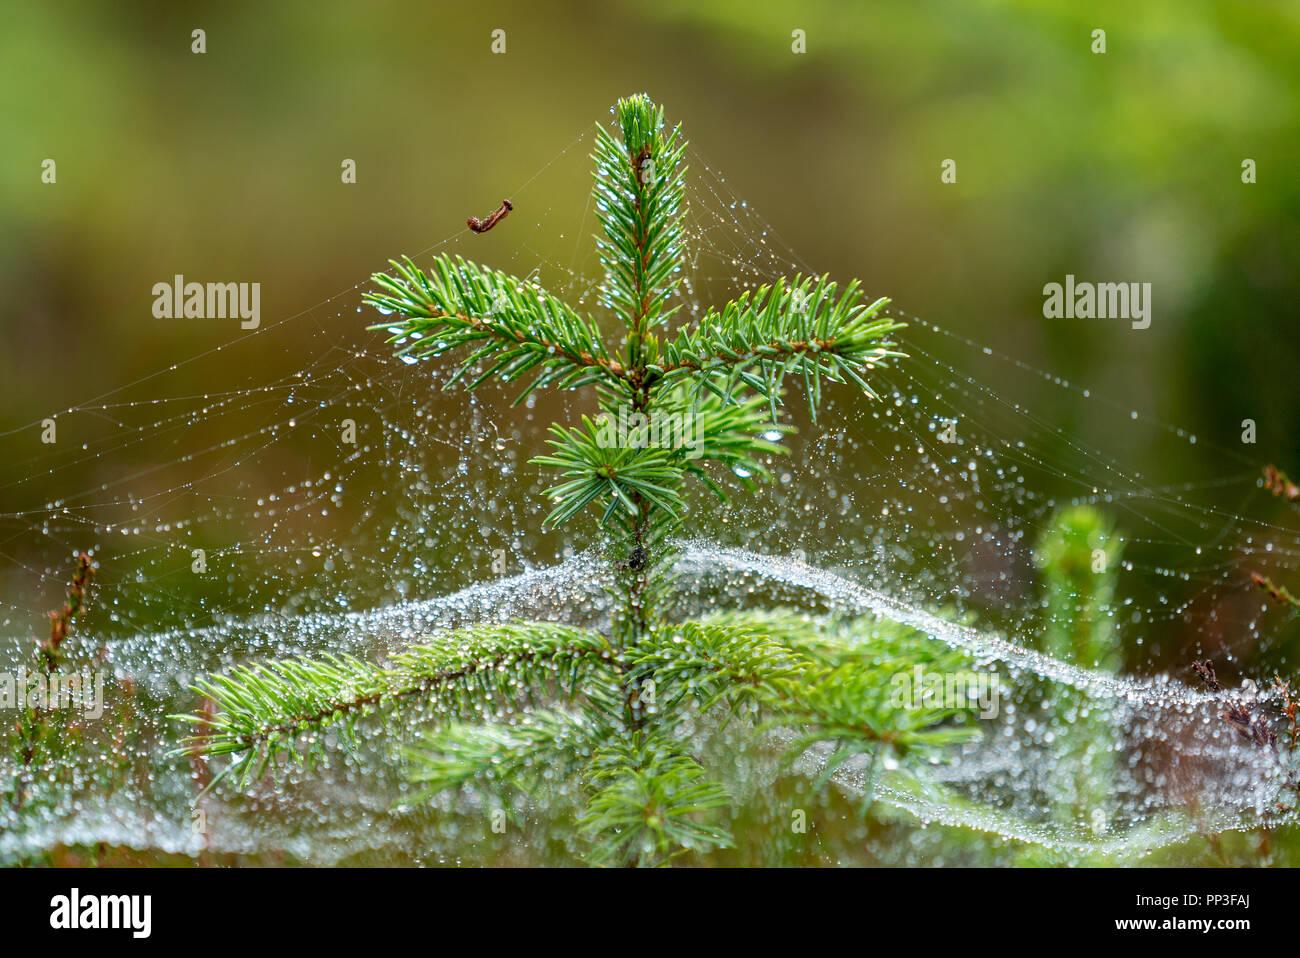 Caterpillar Carry Water Drops on Silk Line Around Christmas TreeStock Photo